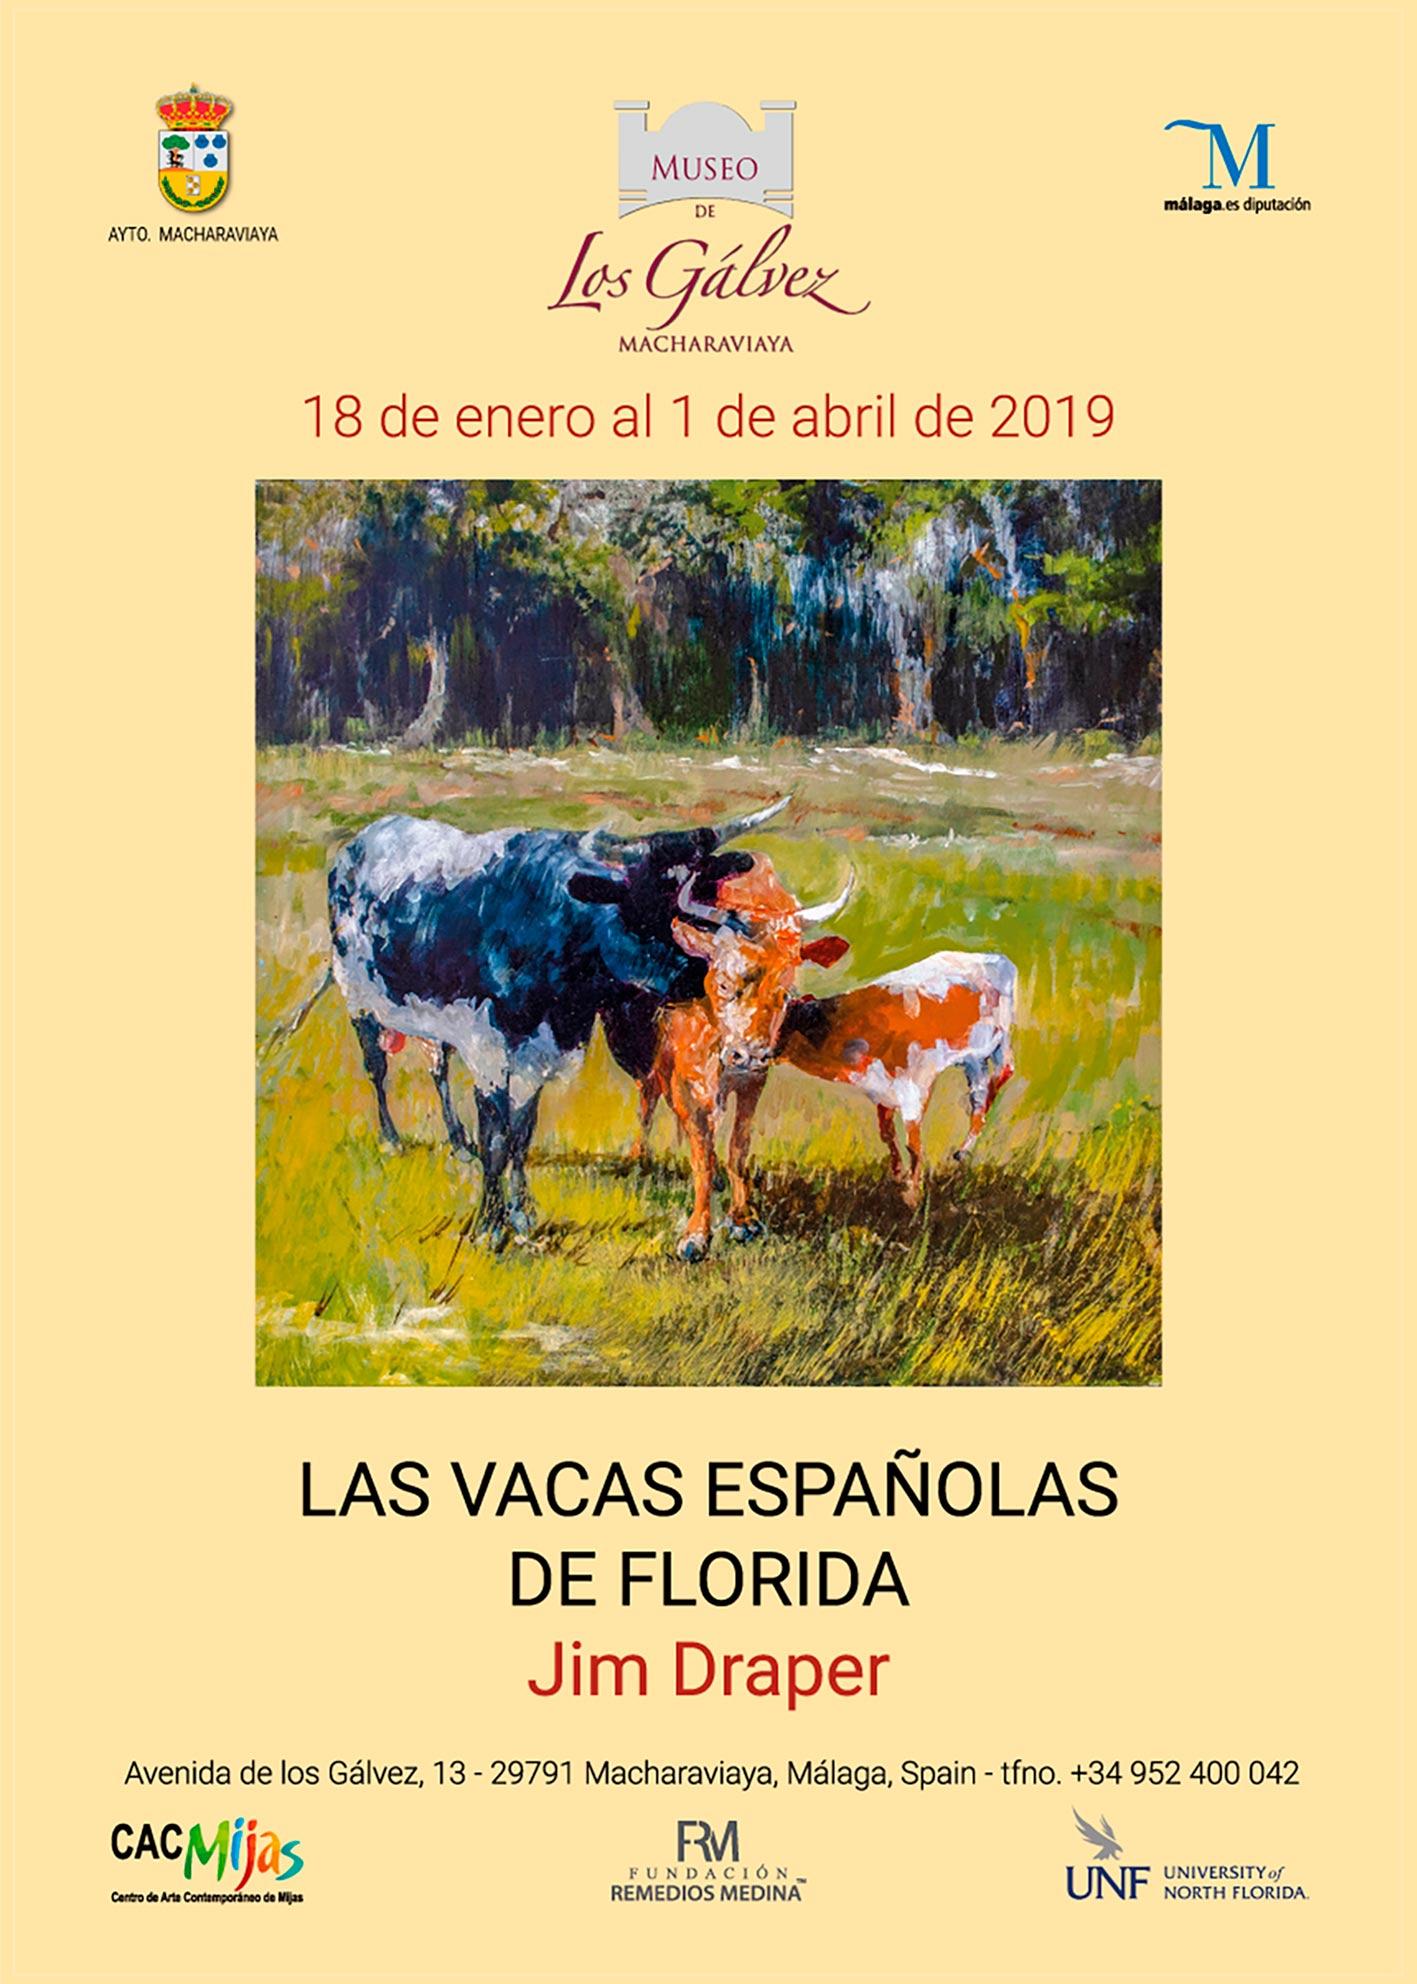 JIM DRAPER. LAS VACAS ESPAÑOLAS DE FLORIDA